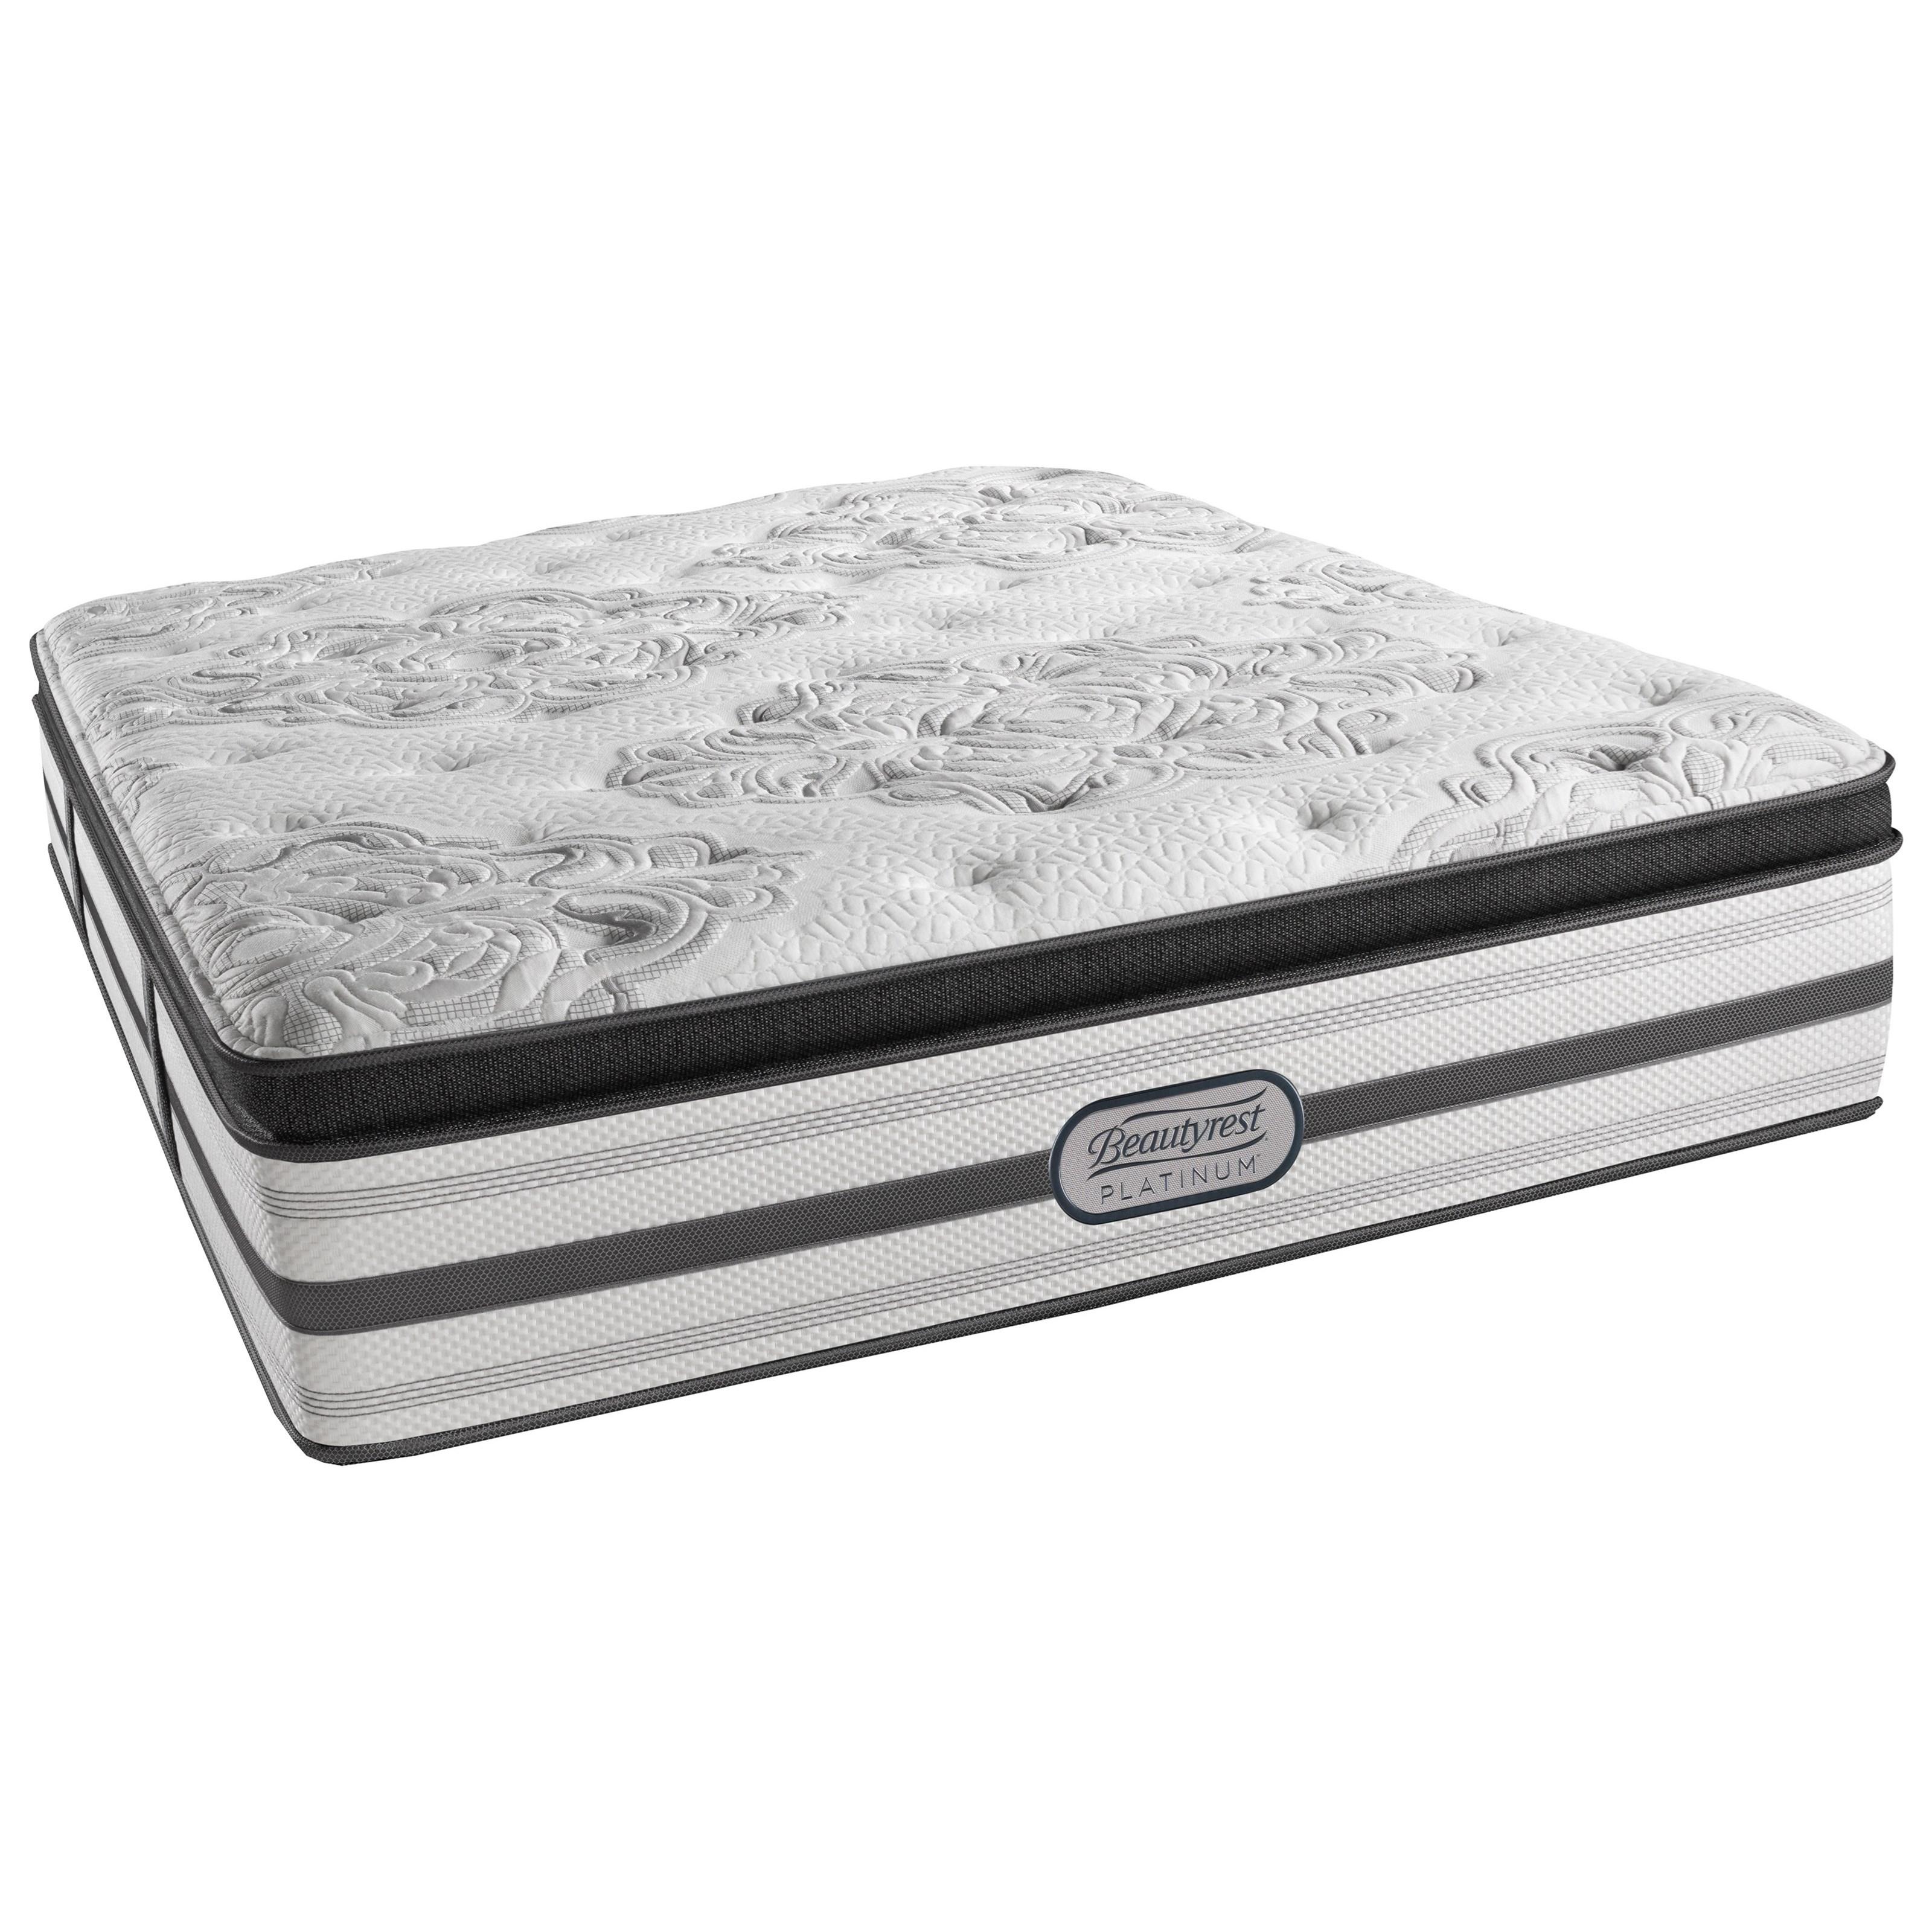 Beautyrest Platinum Gabriella Twin XL Lux Firm Pillow Top Adjustable Set - Item Number: LV3LFPT-TXL+SM1-TXL